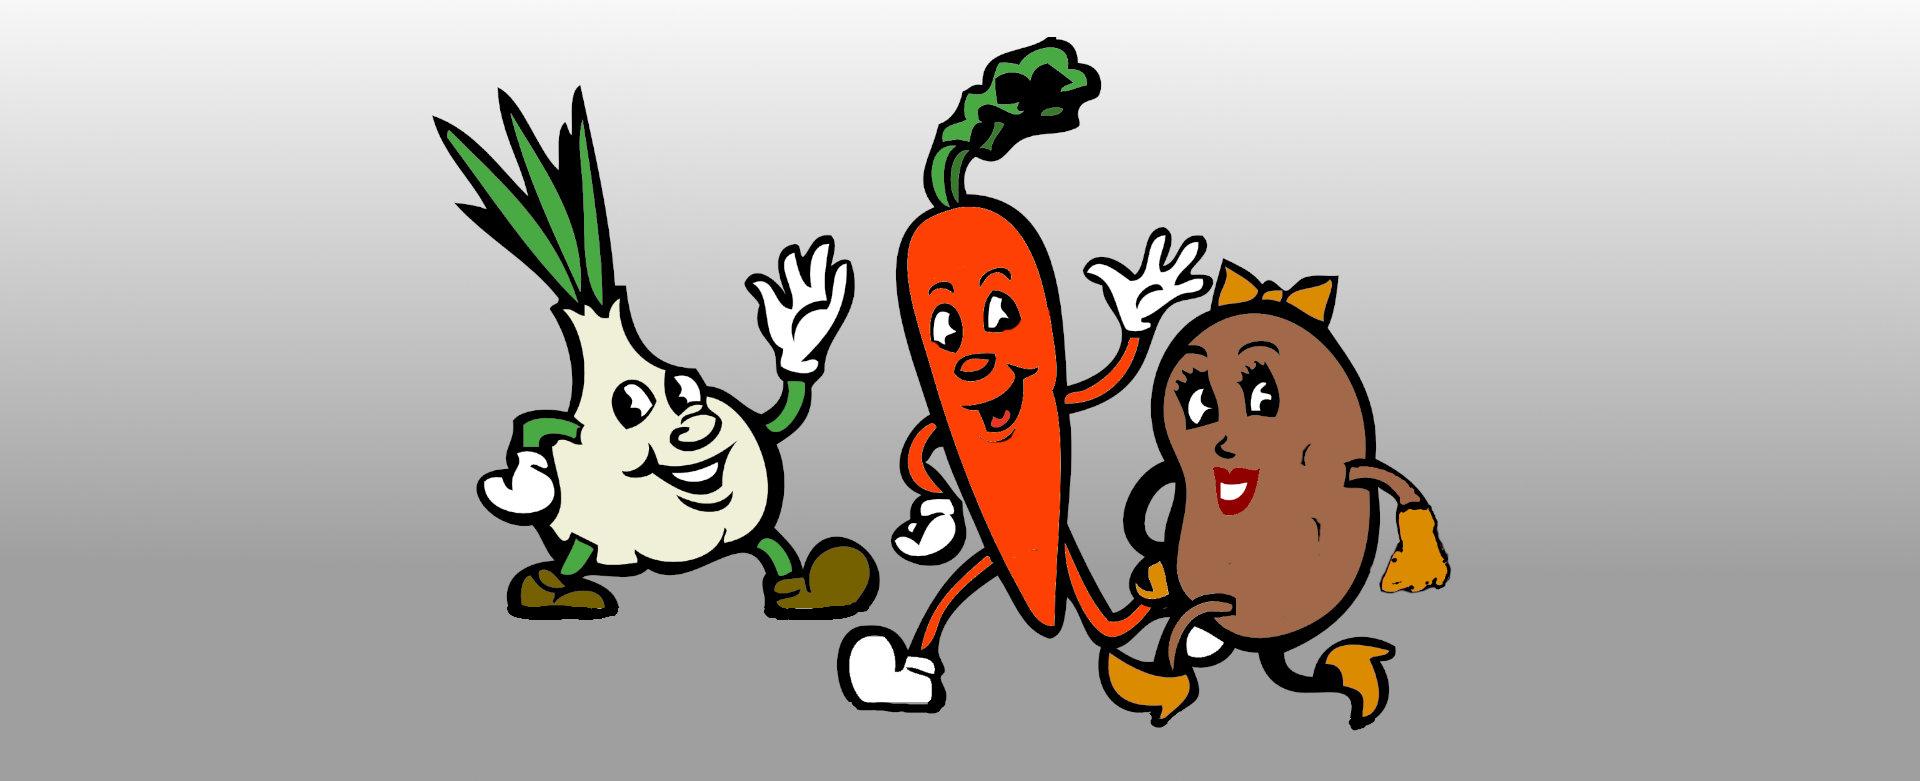 Wir sind das freakige Gemüse